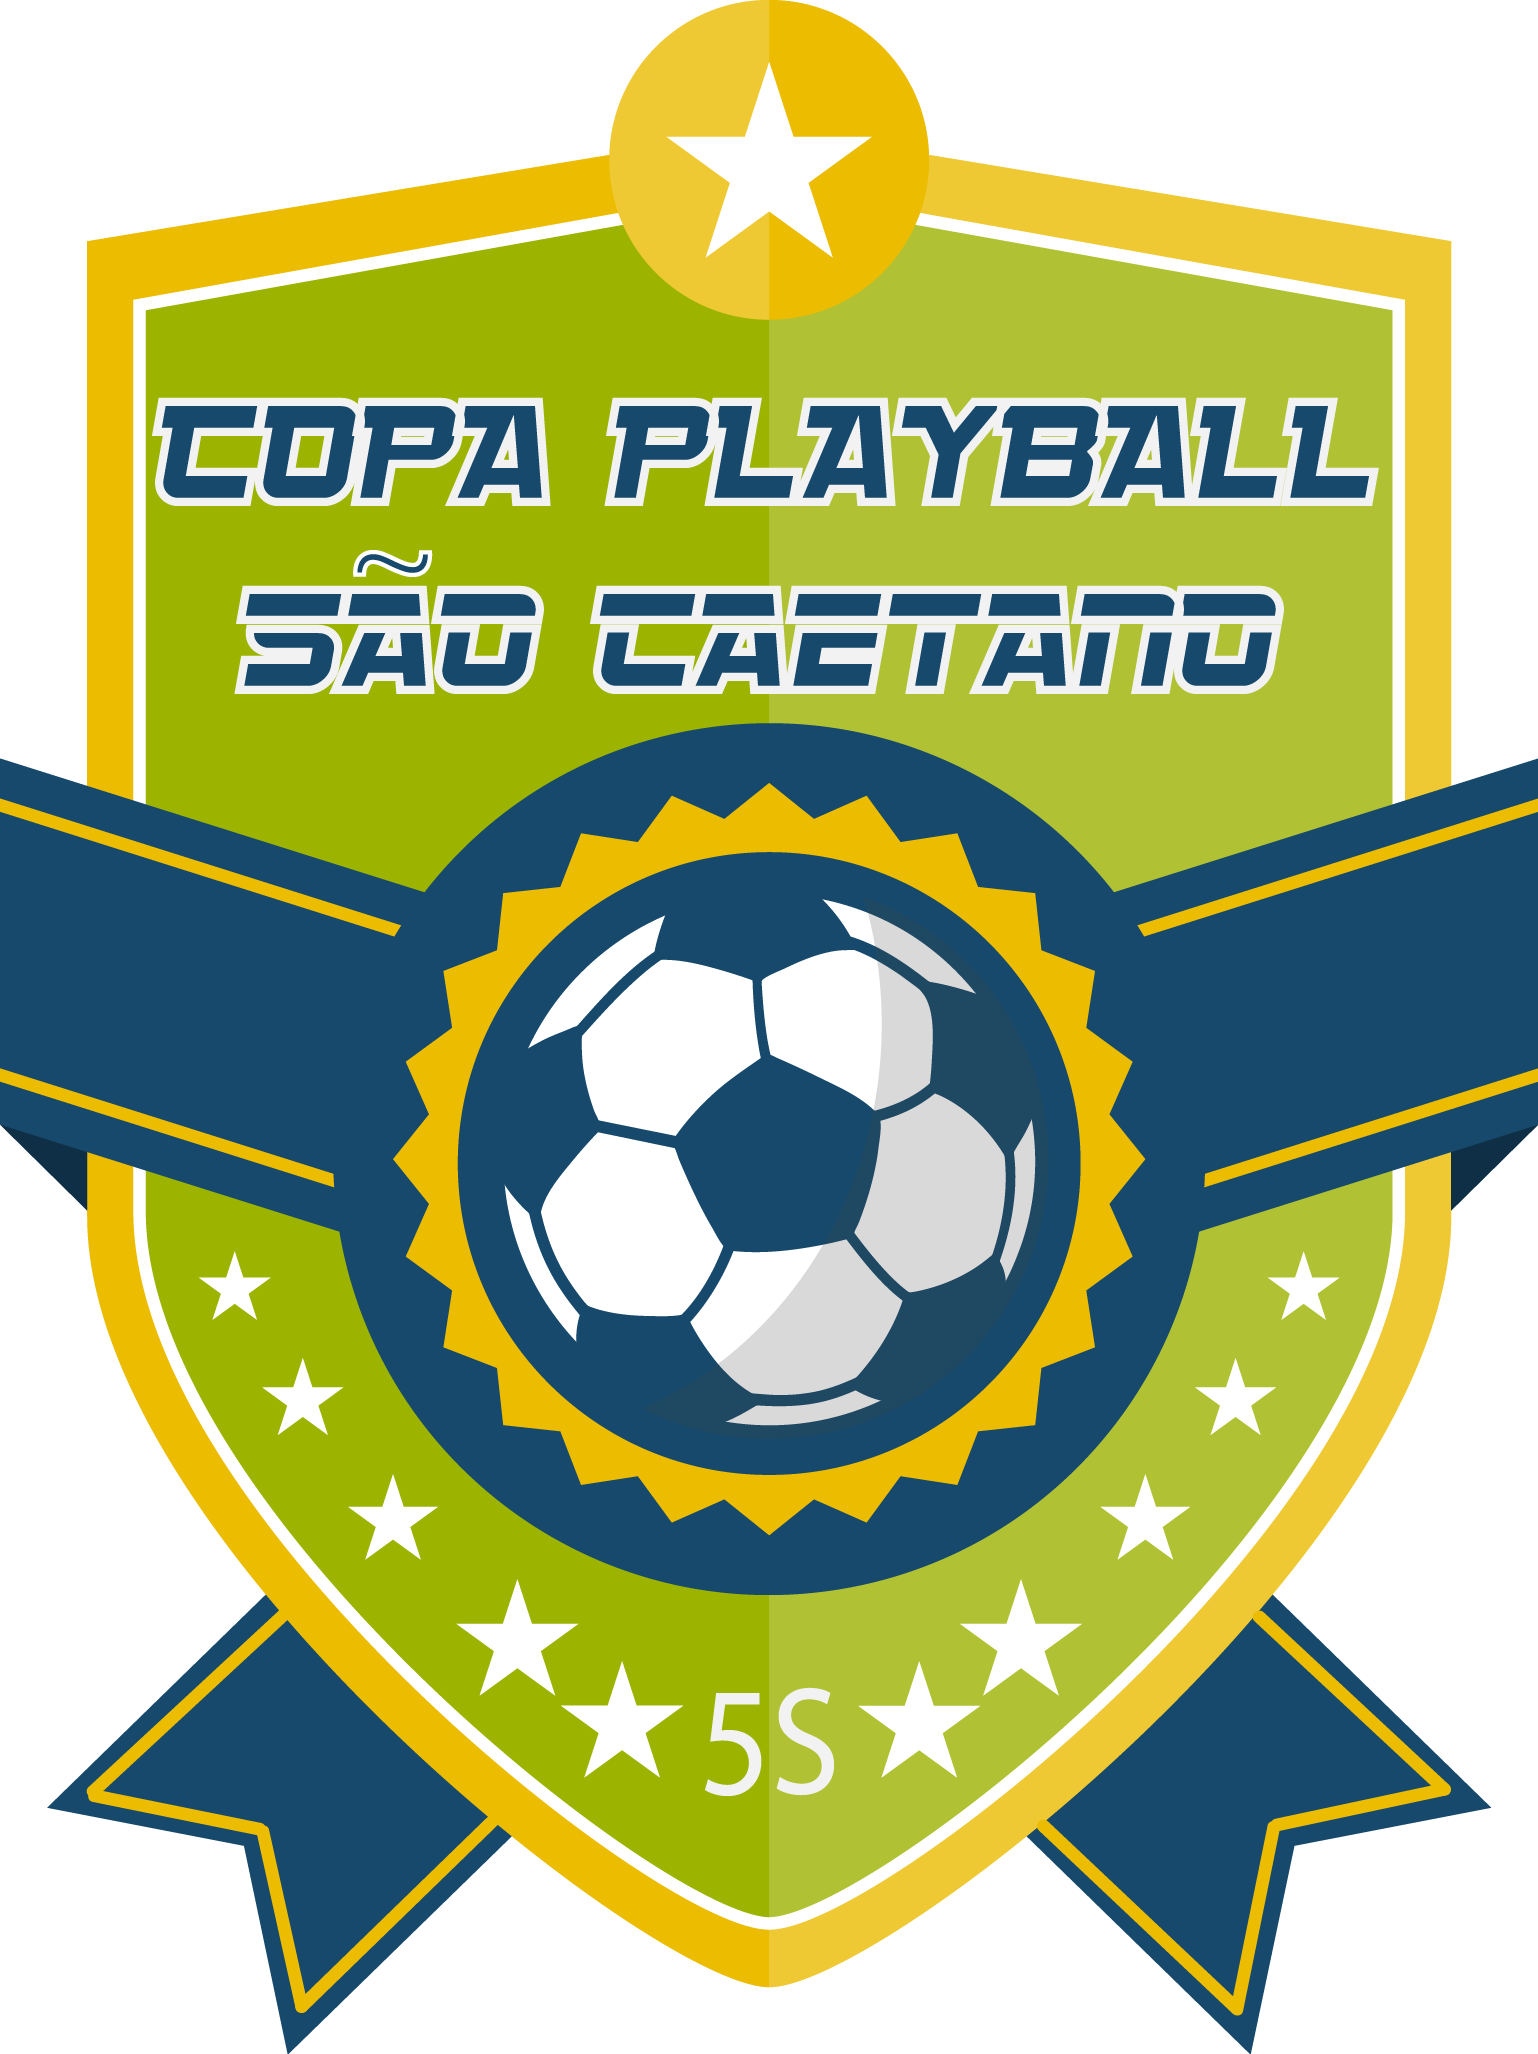 Copa Playball São Caetano Serie C